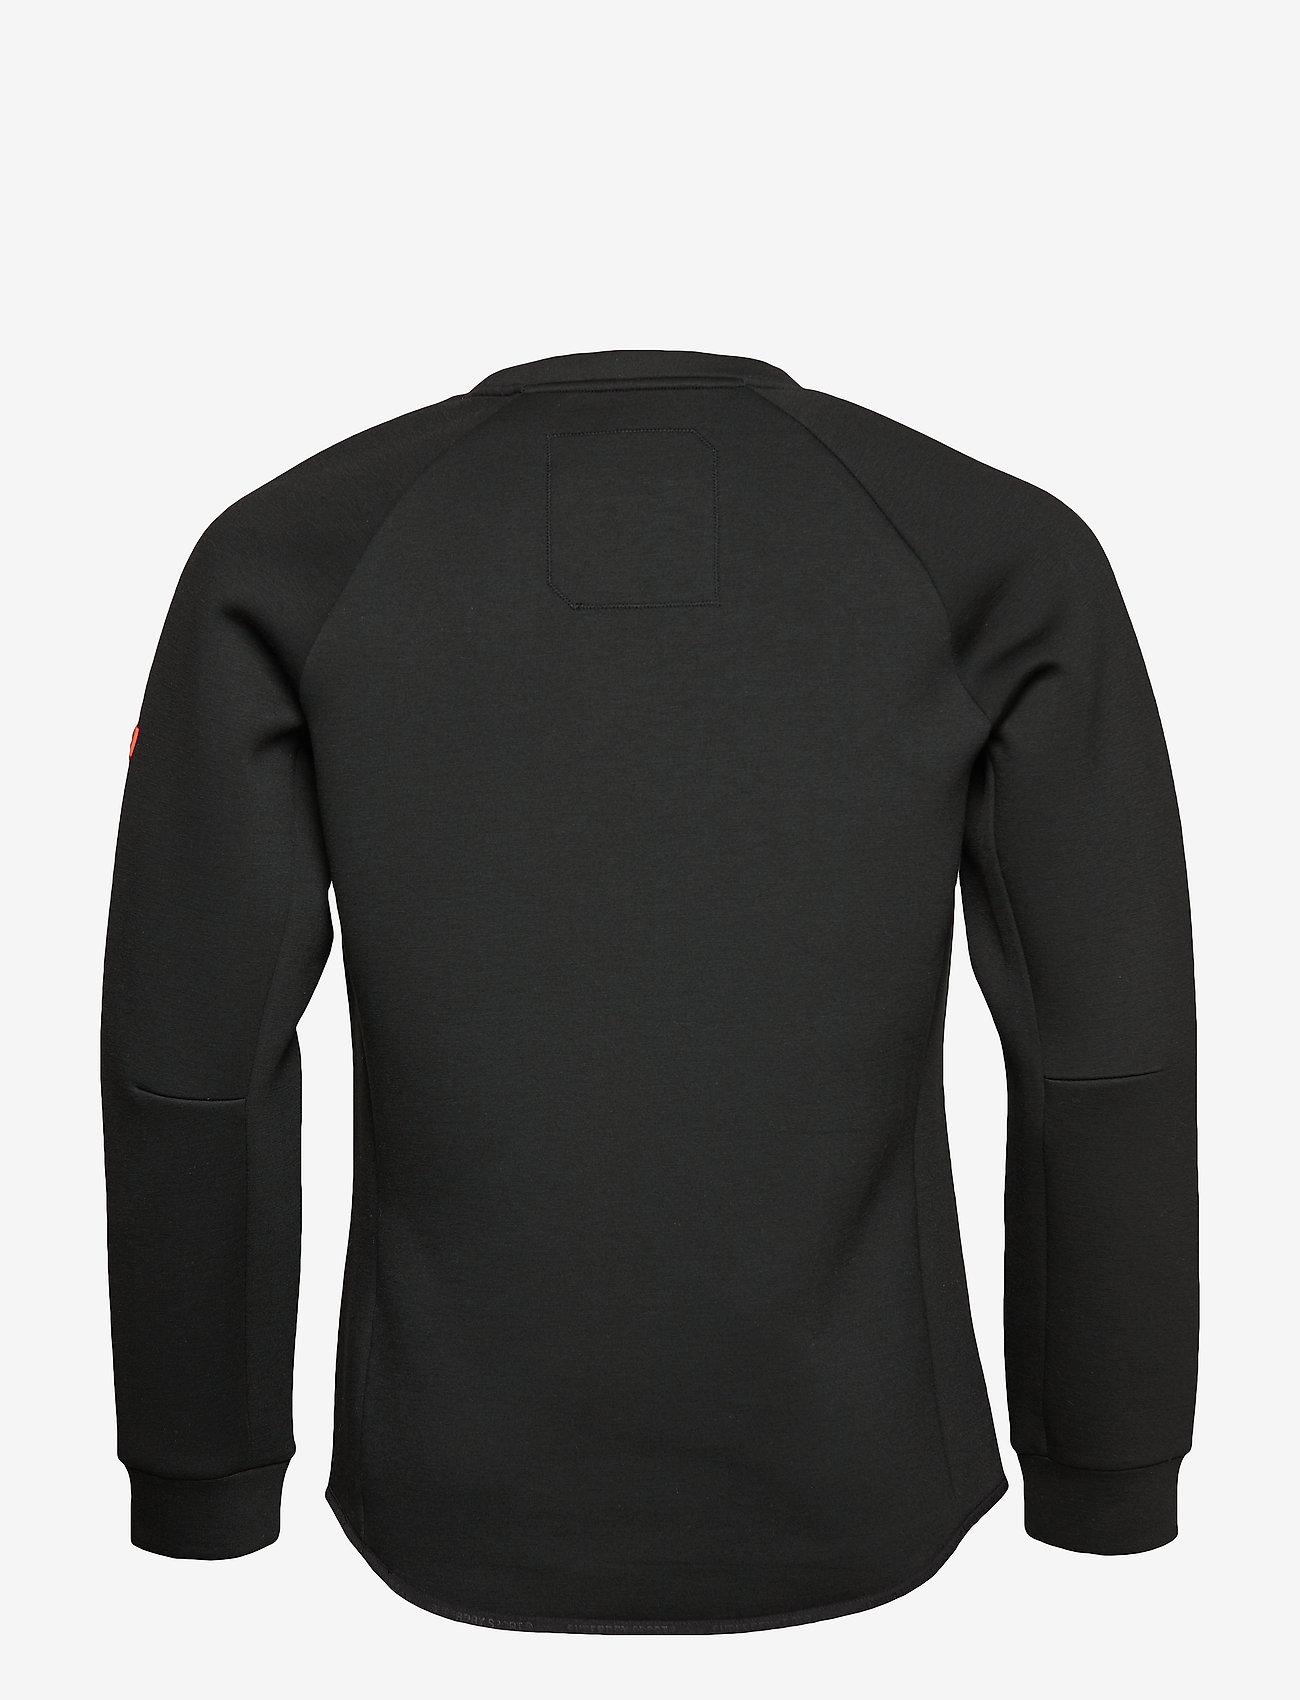 Gym Tech Stretch Crew (Black) (41.99 €) - Superdry Sport 3nbXe